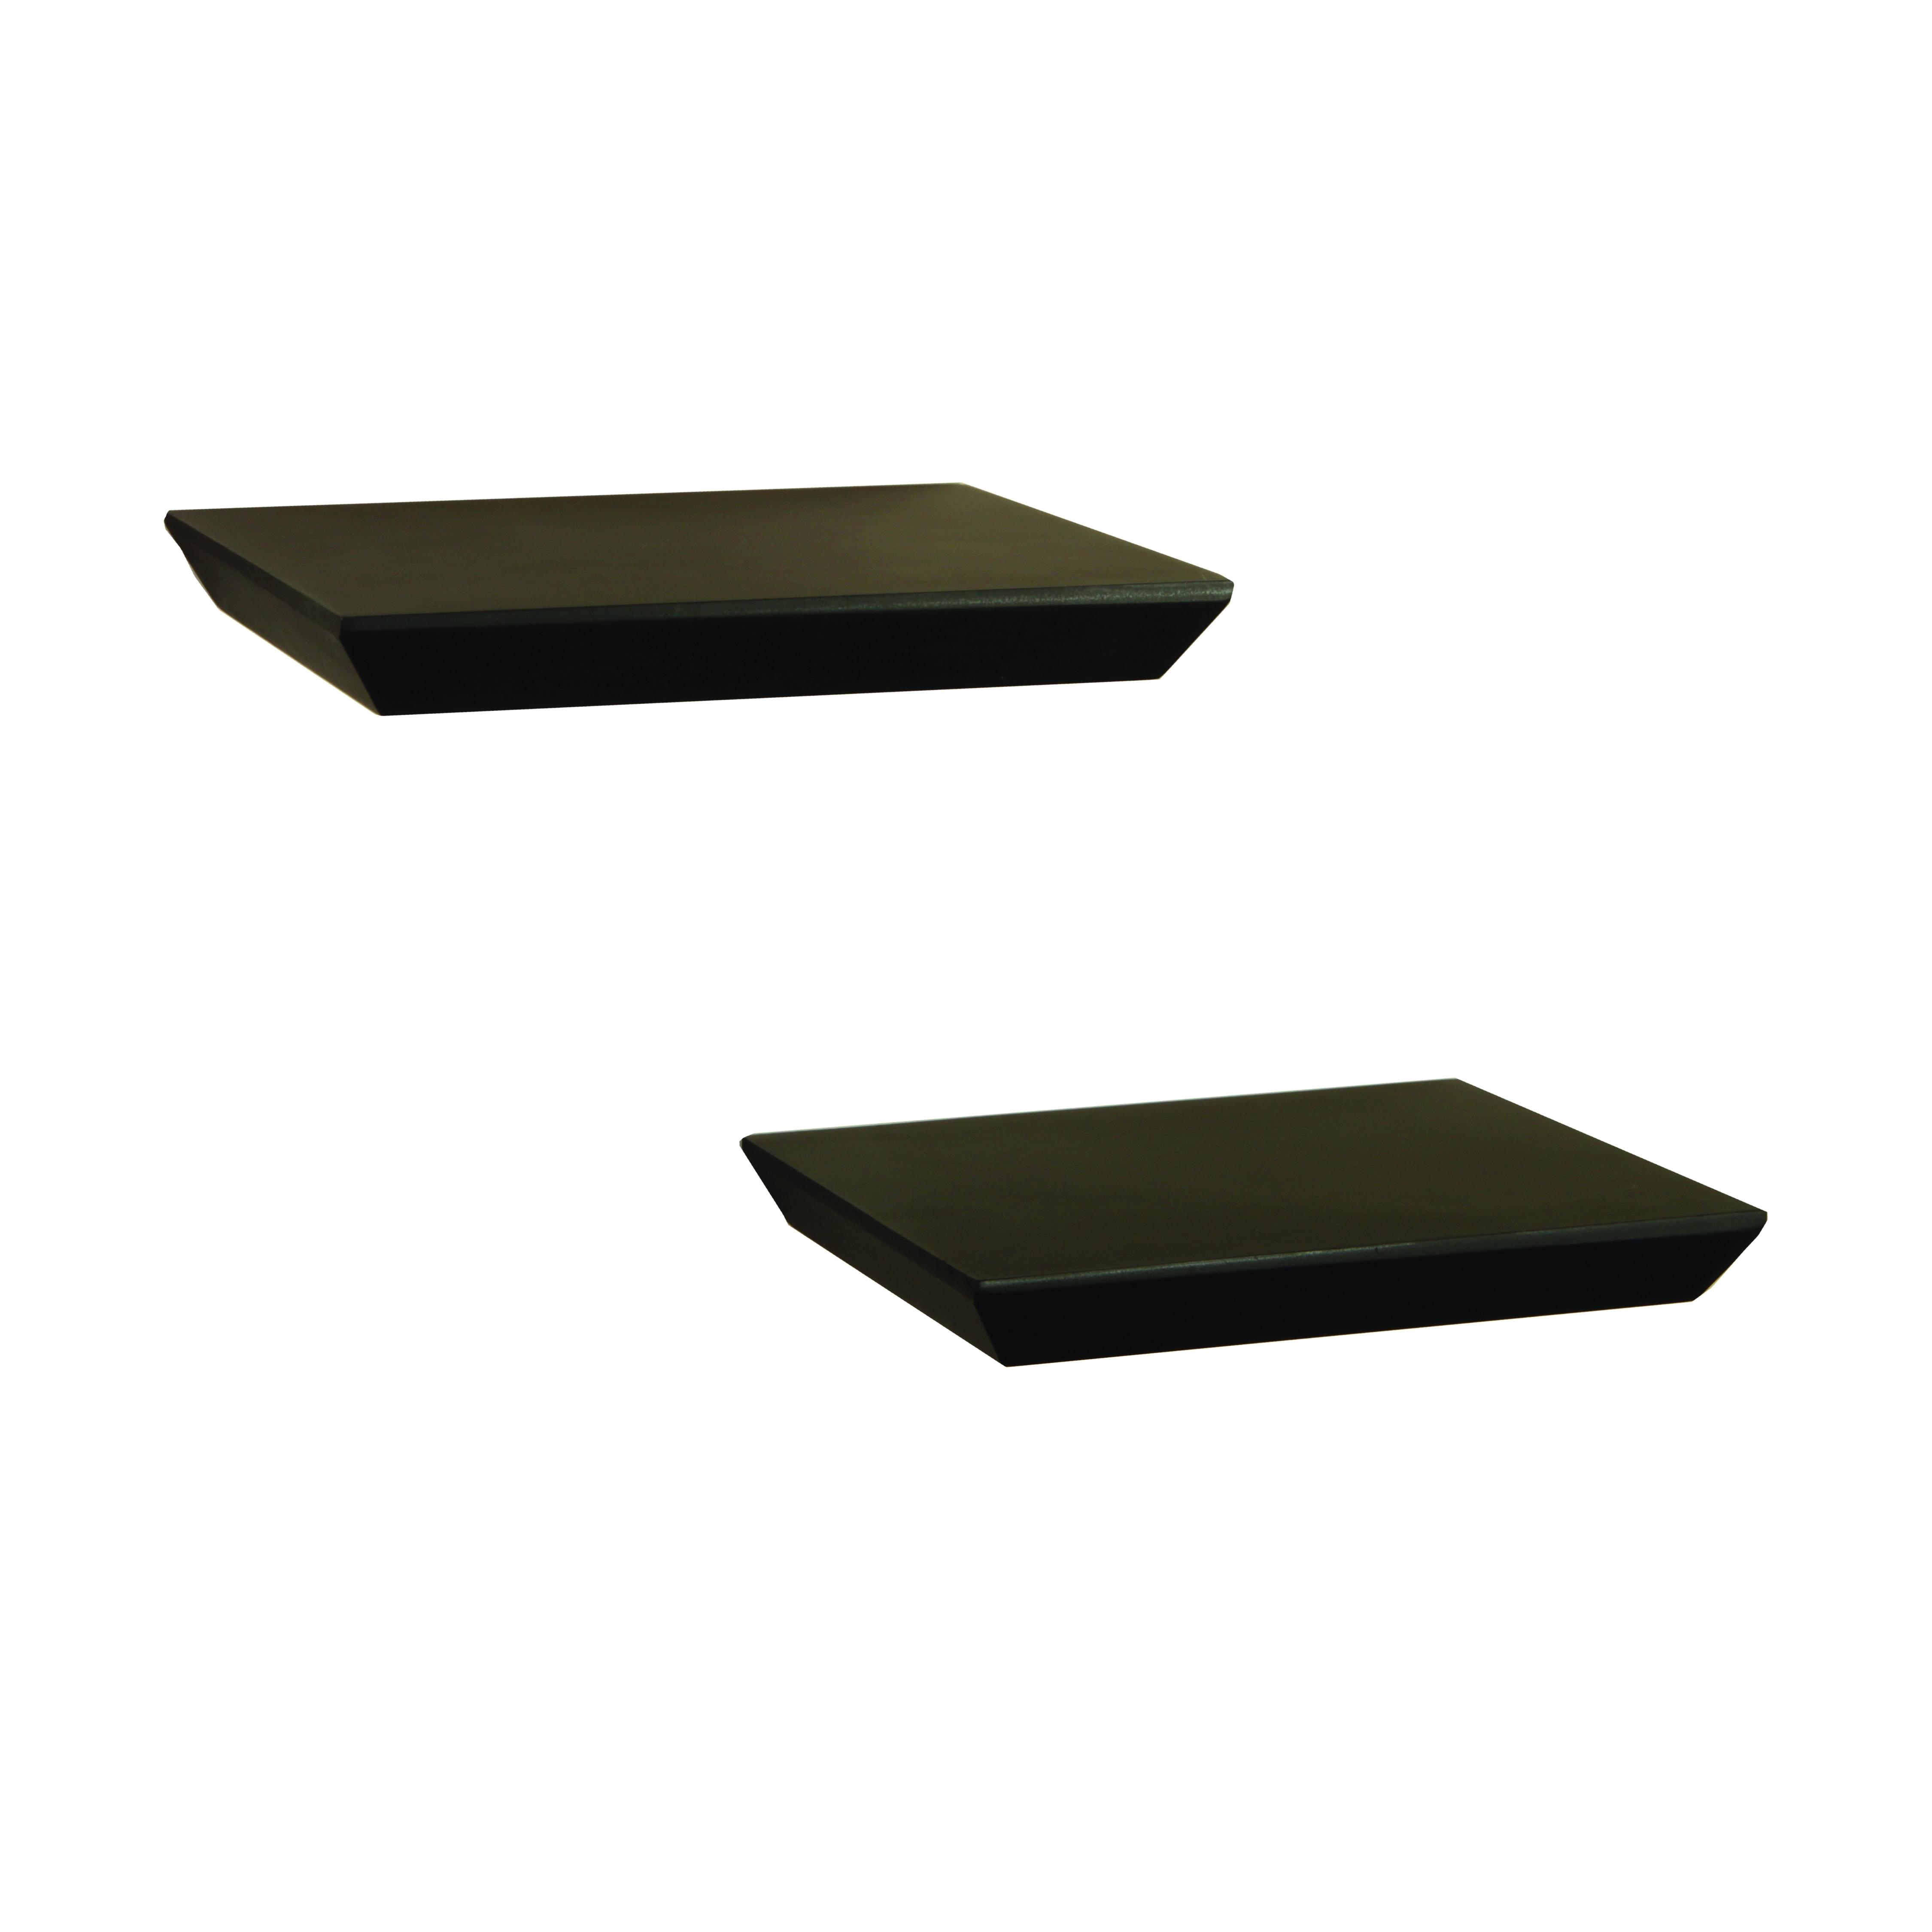 Picture of Knape & Vogt Shelf-Made 0140-2X10BK Floating Shelf, 30 lb, 2-Shelf, 8 in L, 10 in W, Wood